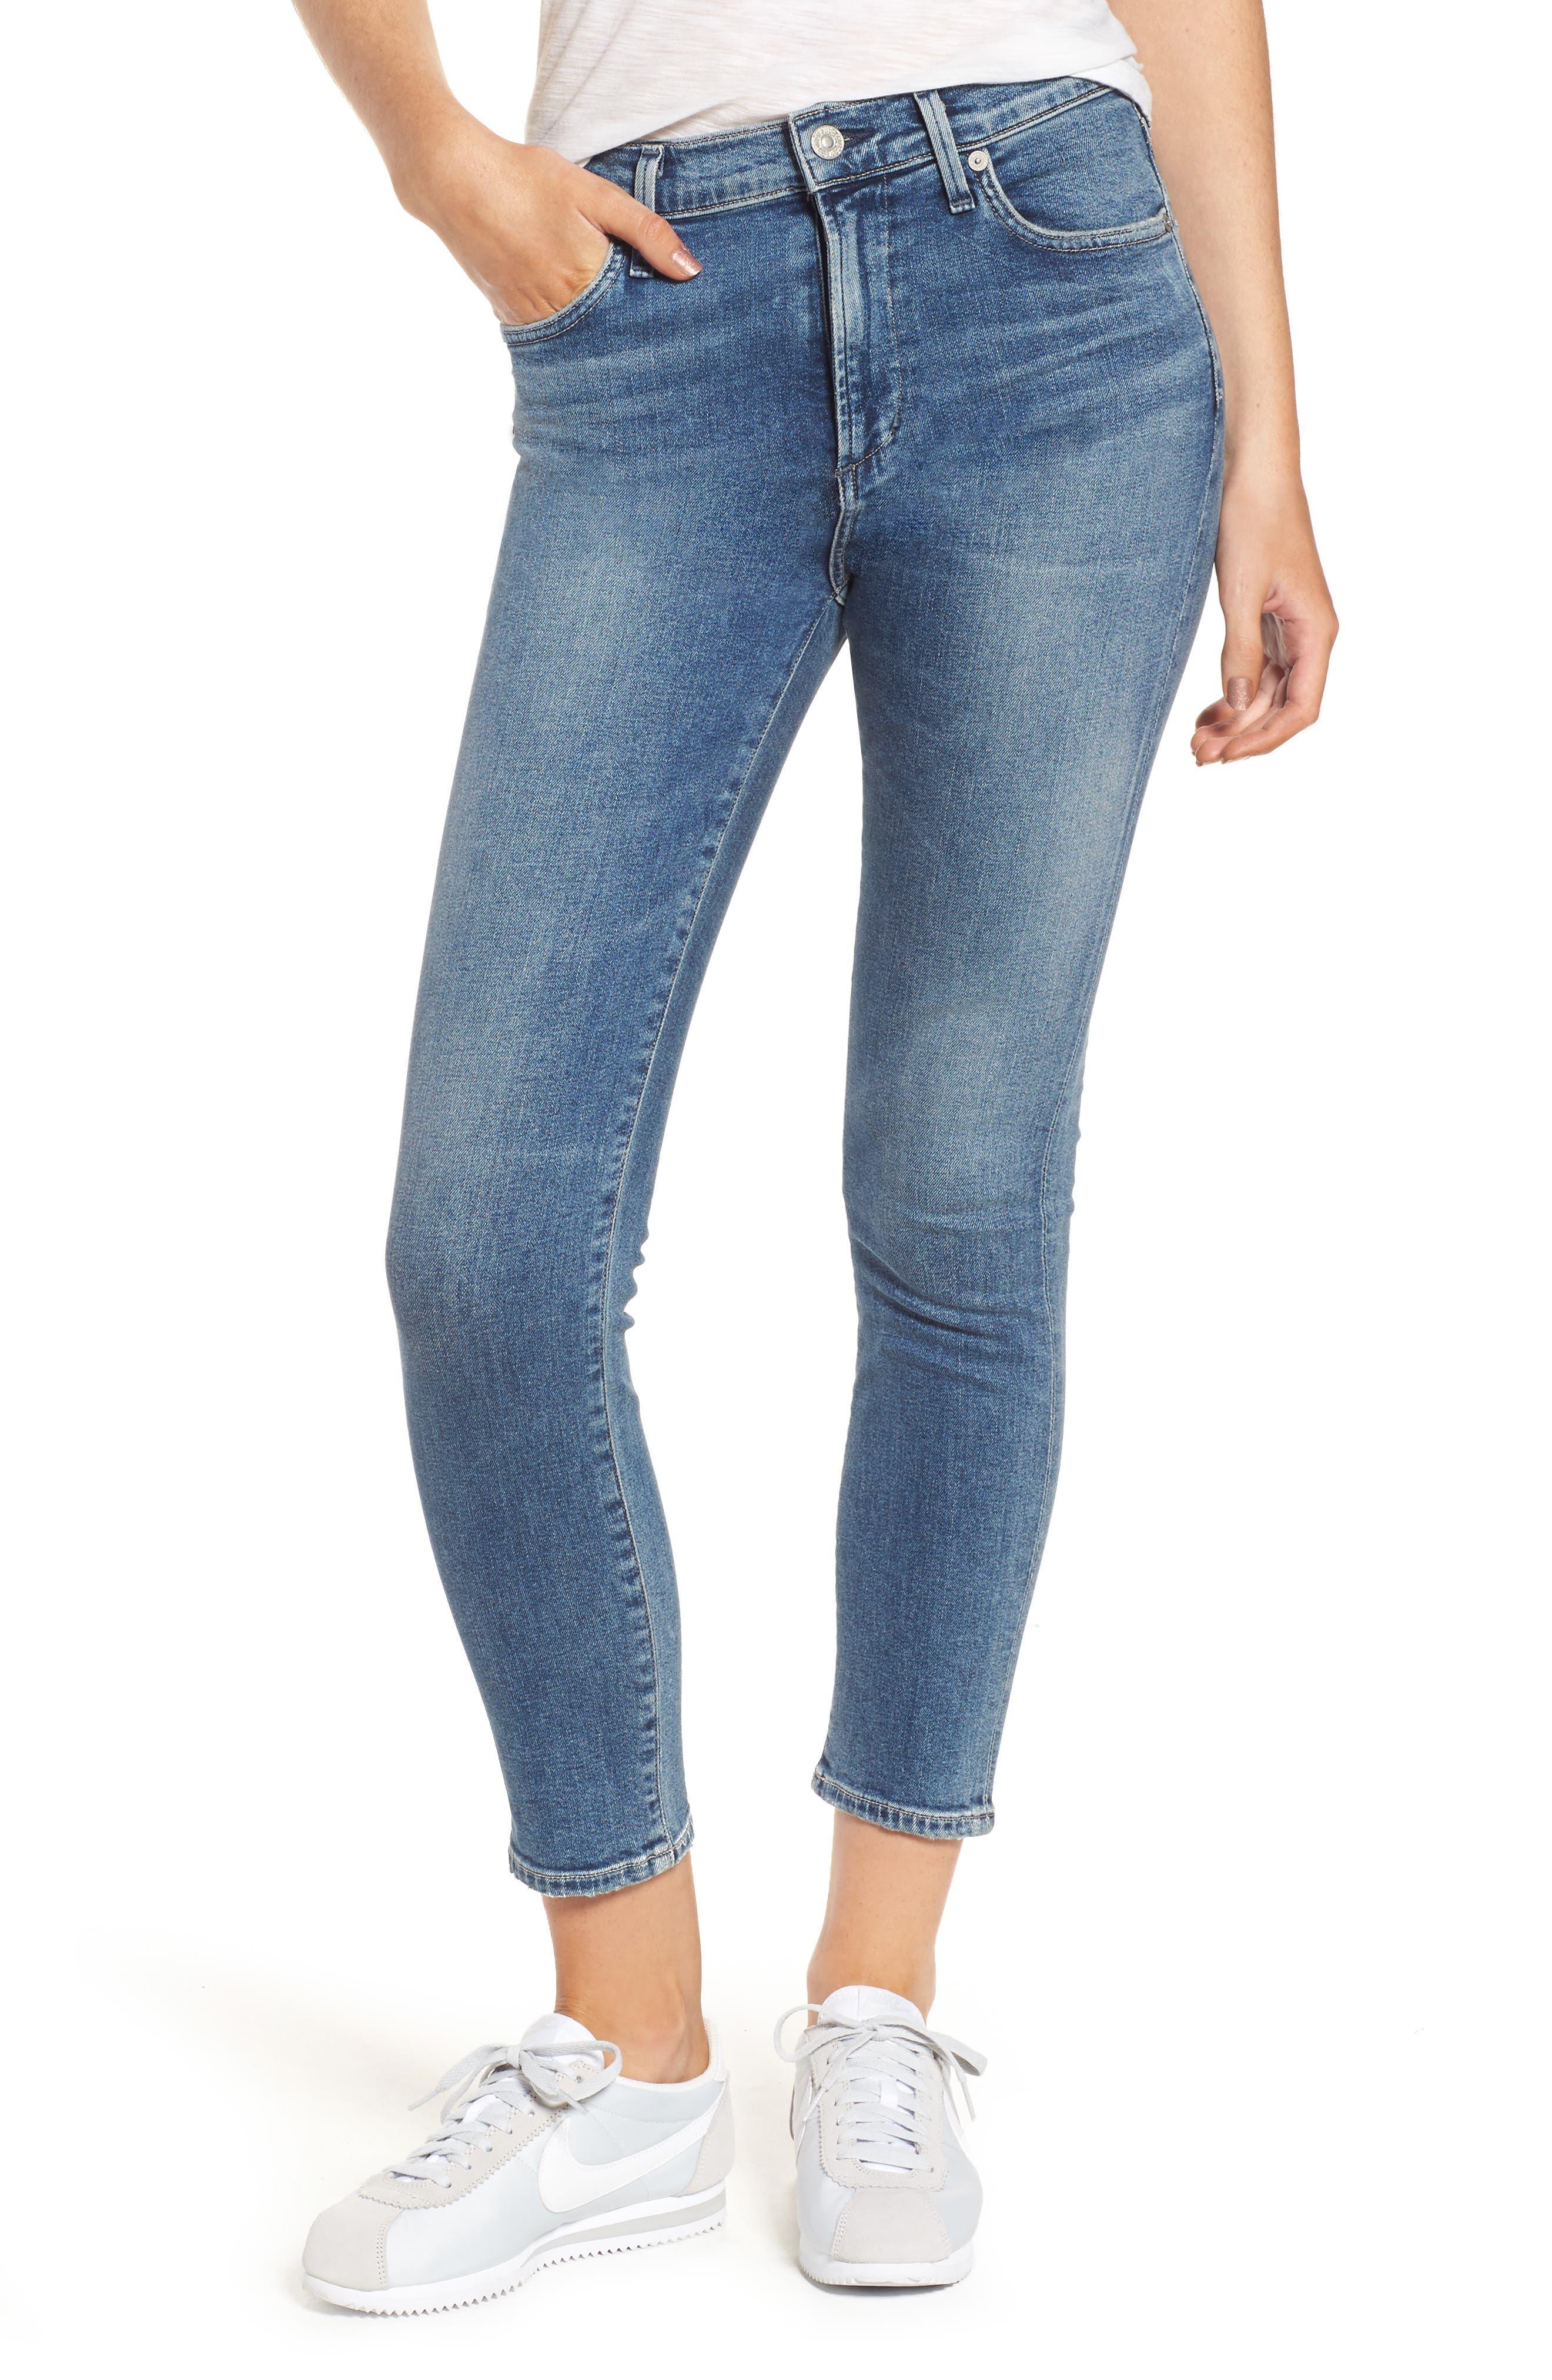 Main Image - Citizens of Humanity Rocket Crop Skinny Jeans (Orbit)